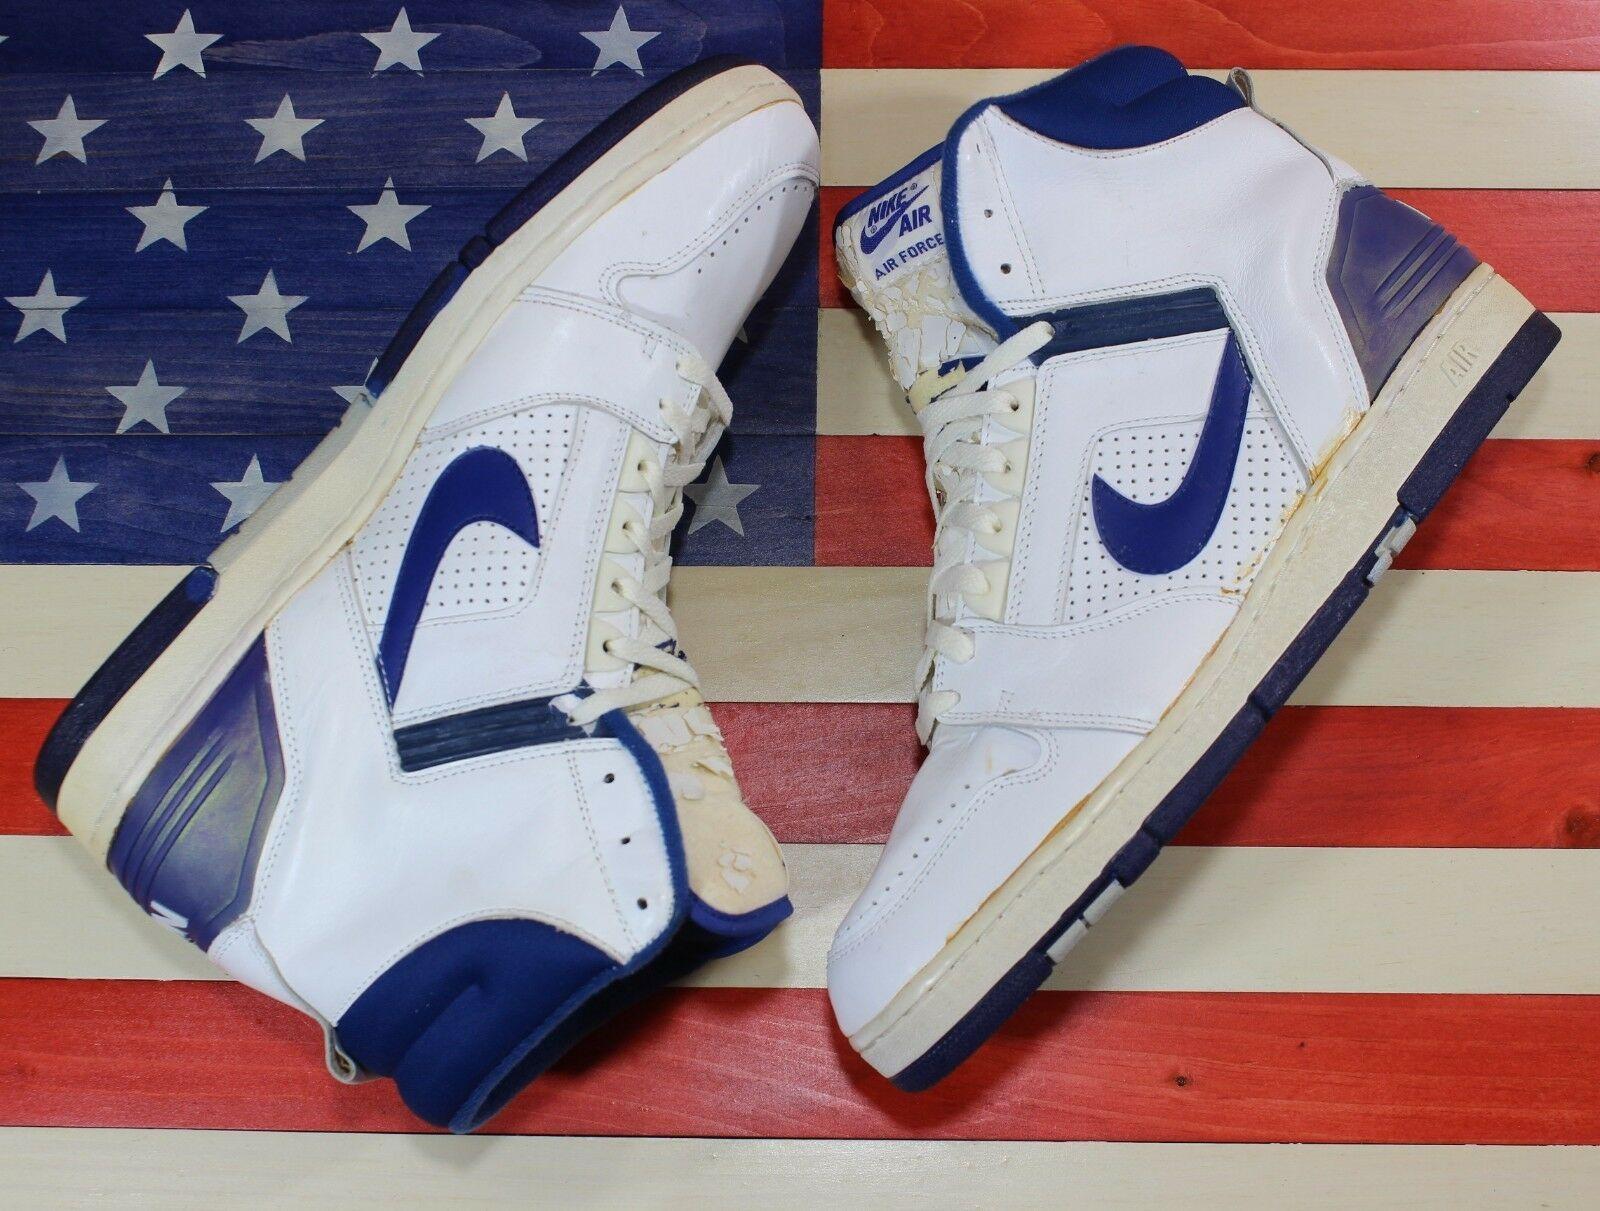 afa56958754d2a Nike Aeronautica II Originale 1987 Scarpe da Basket Bianco Blu 1 2 Og  Vintage -  232.14